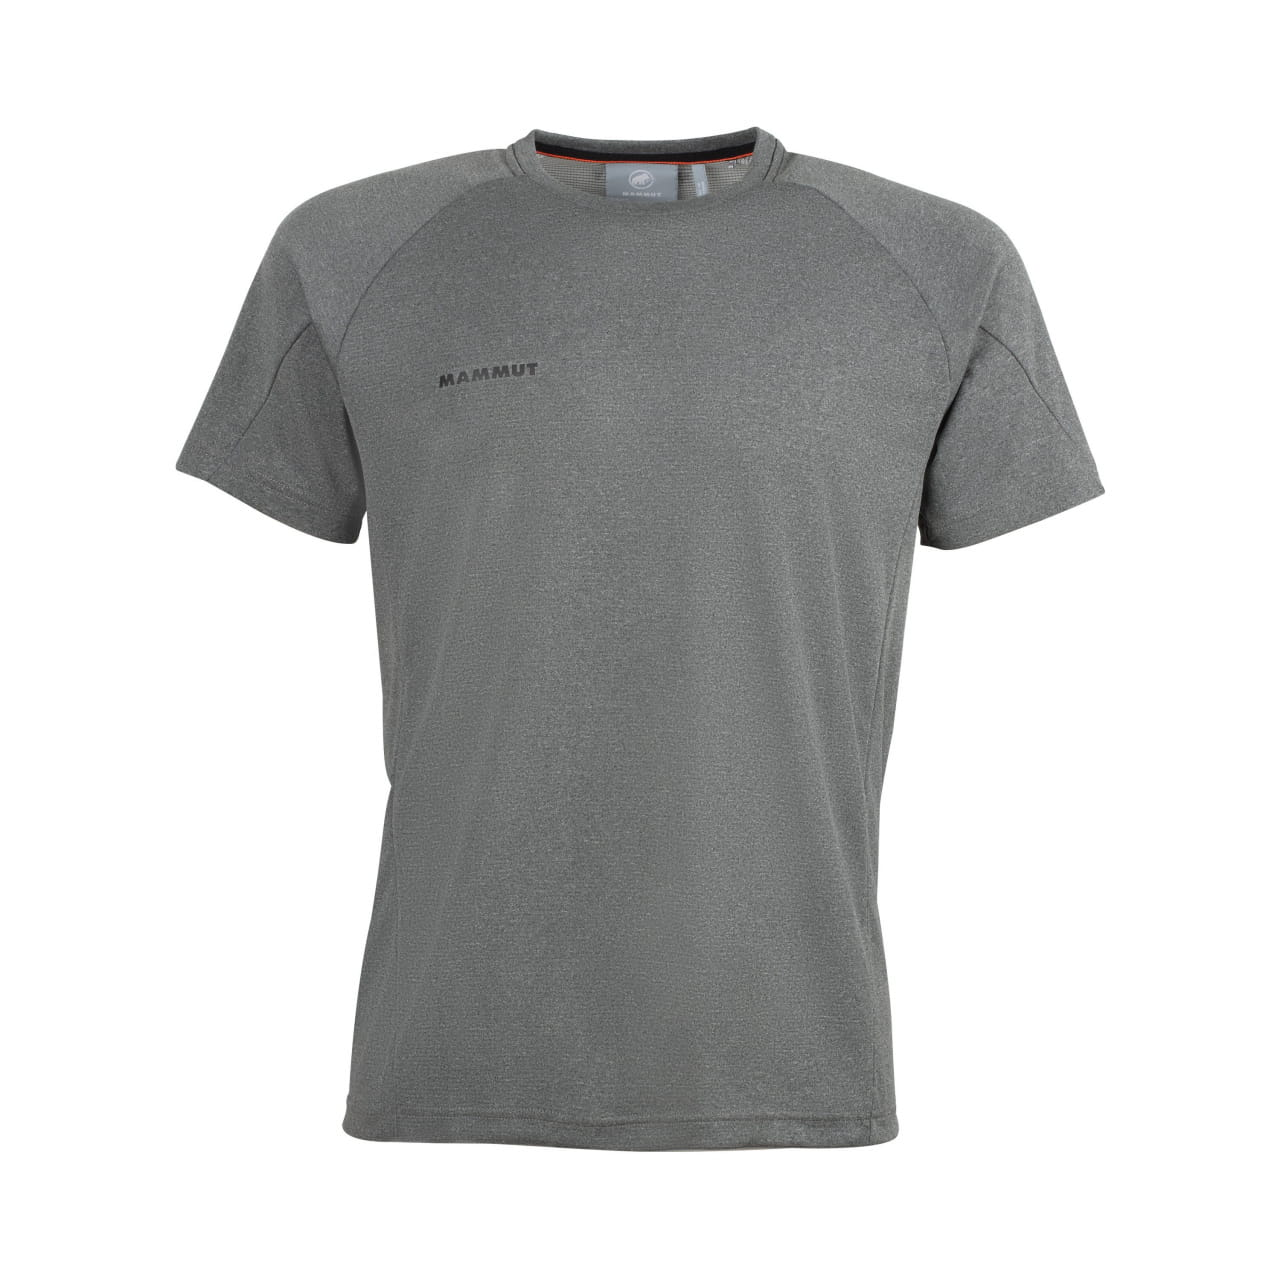 Pánské tričko Mammut Aegility T-Shirt Men